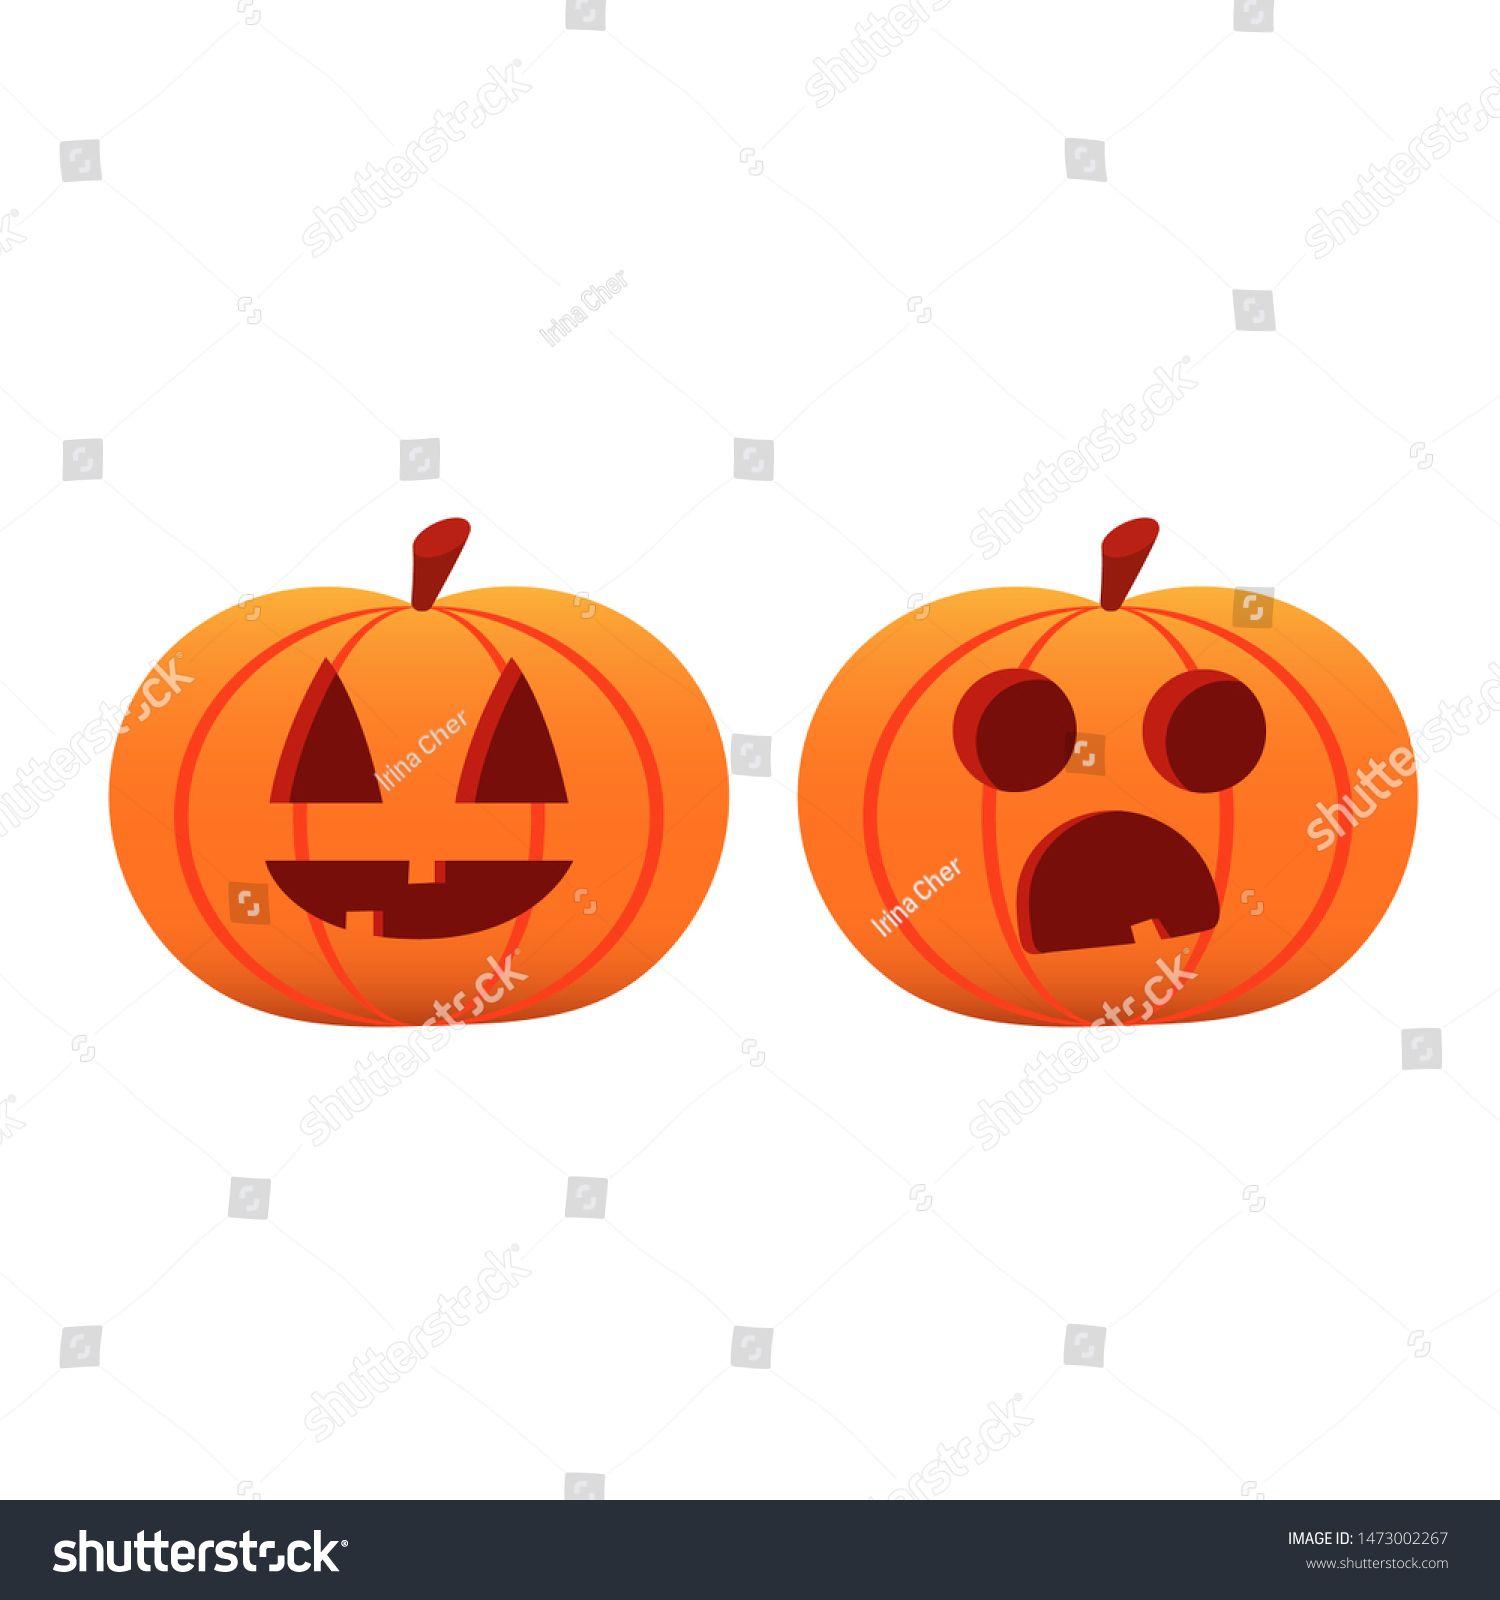 Orange Symbol On Halloween 2020 Set pumpkin on white background. The main symbol of the Halloween